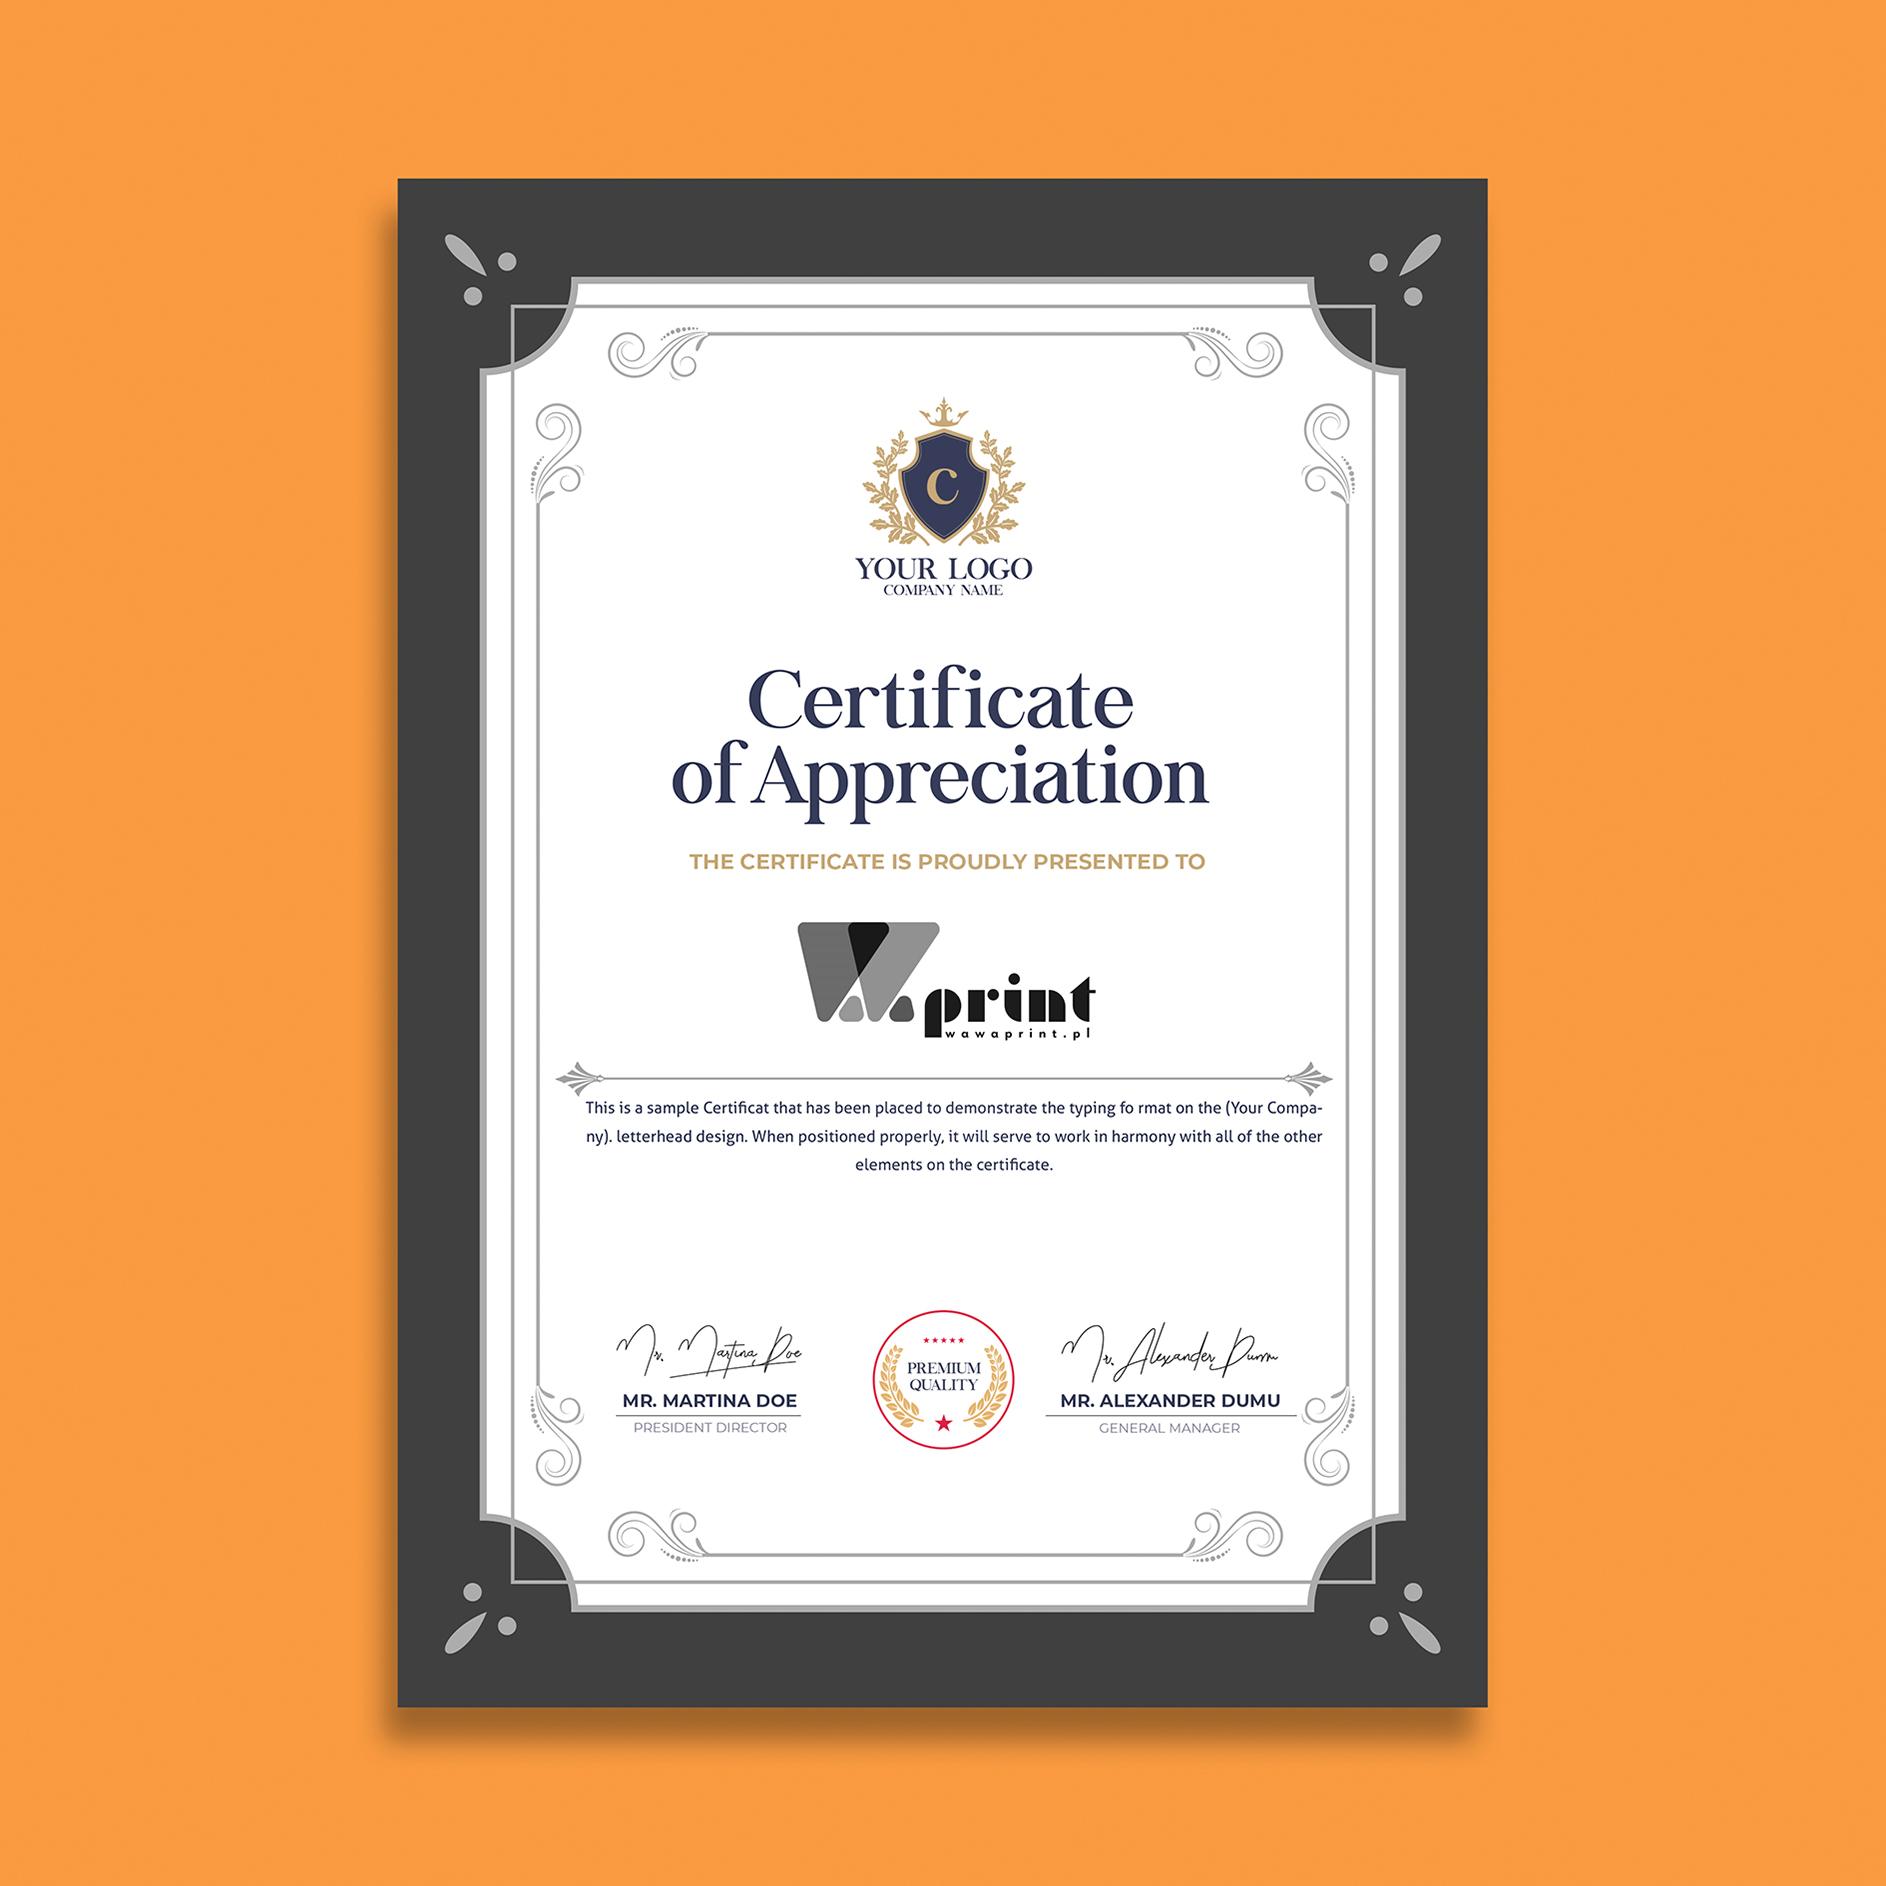 Dyplomy i certyfikaty_image1